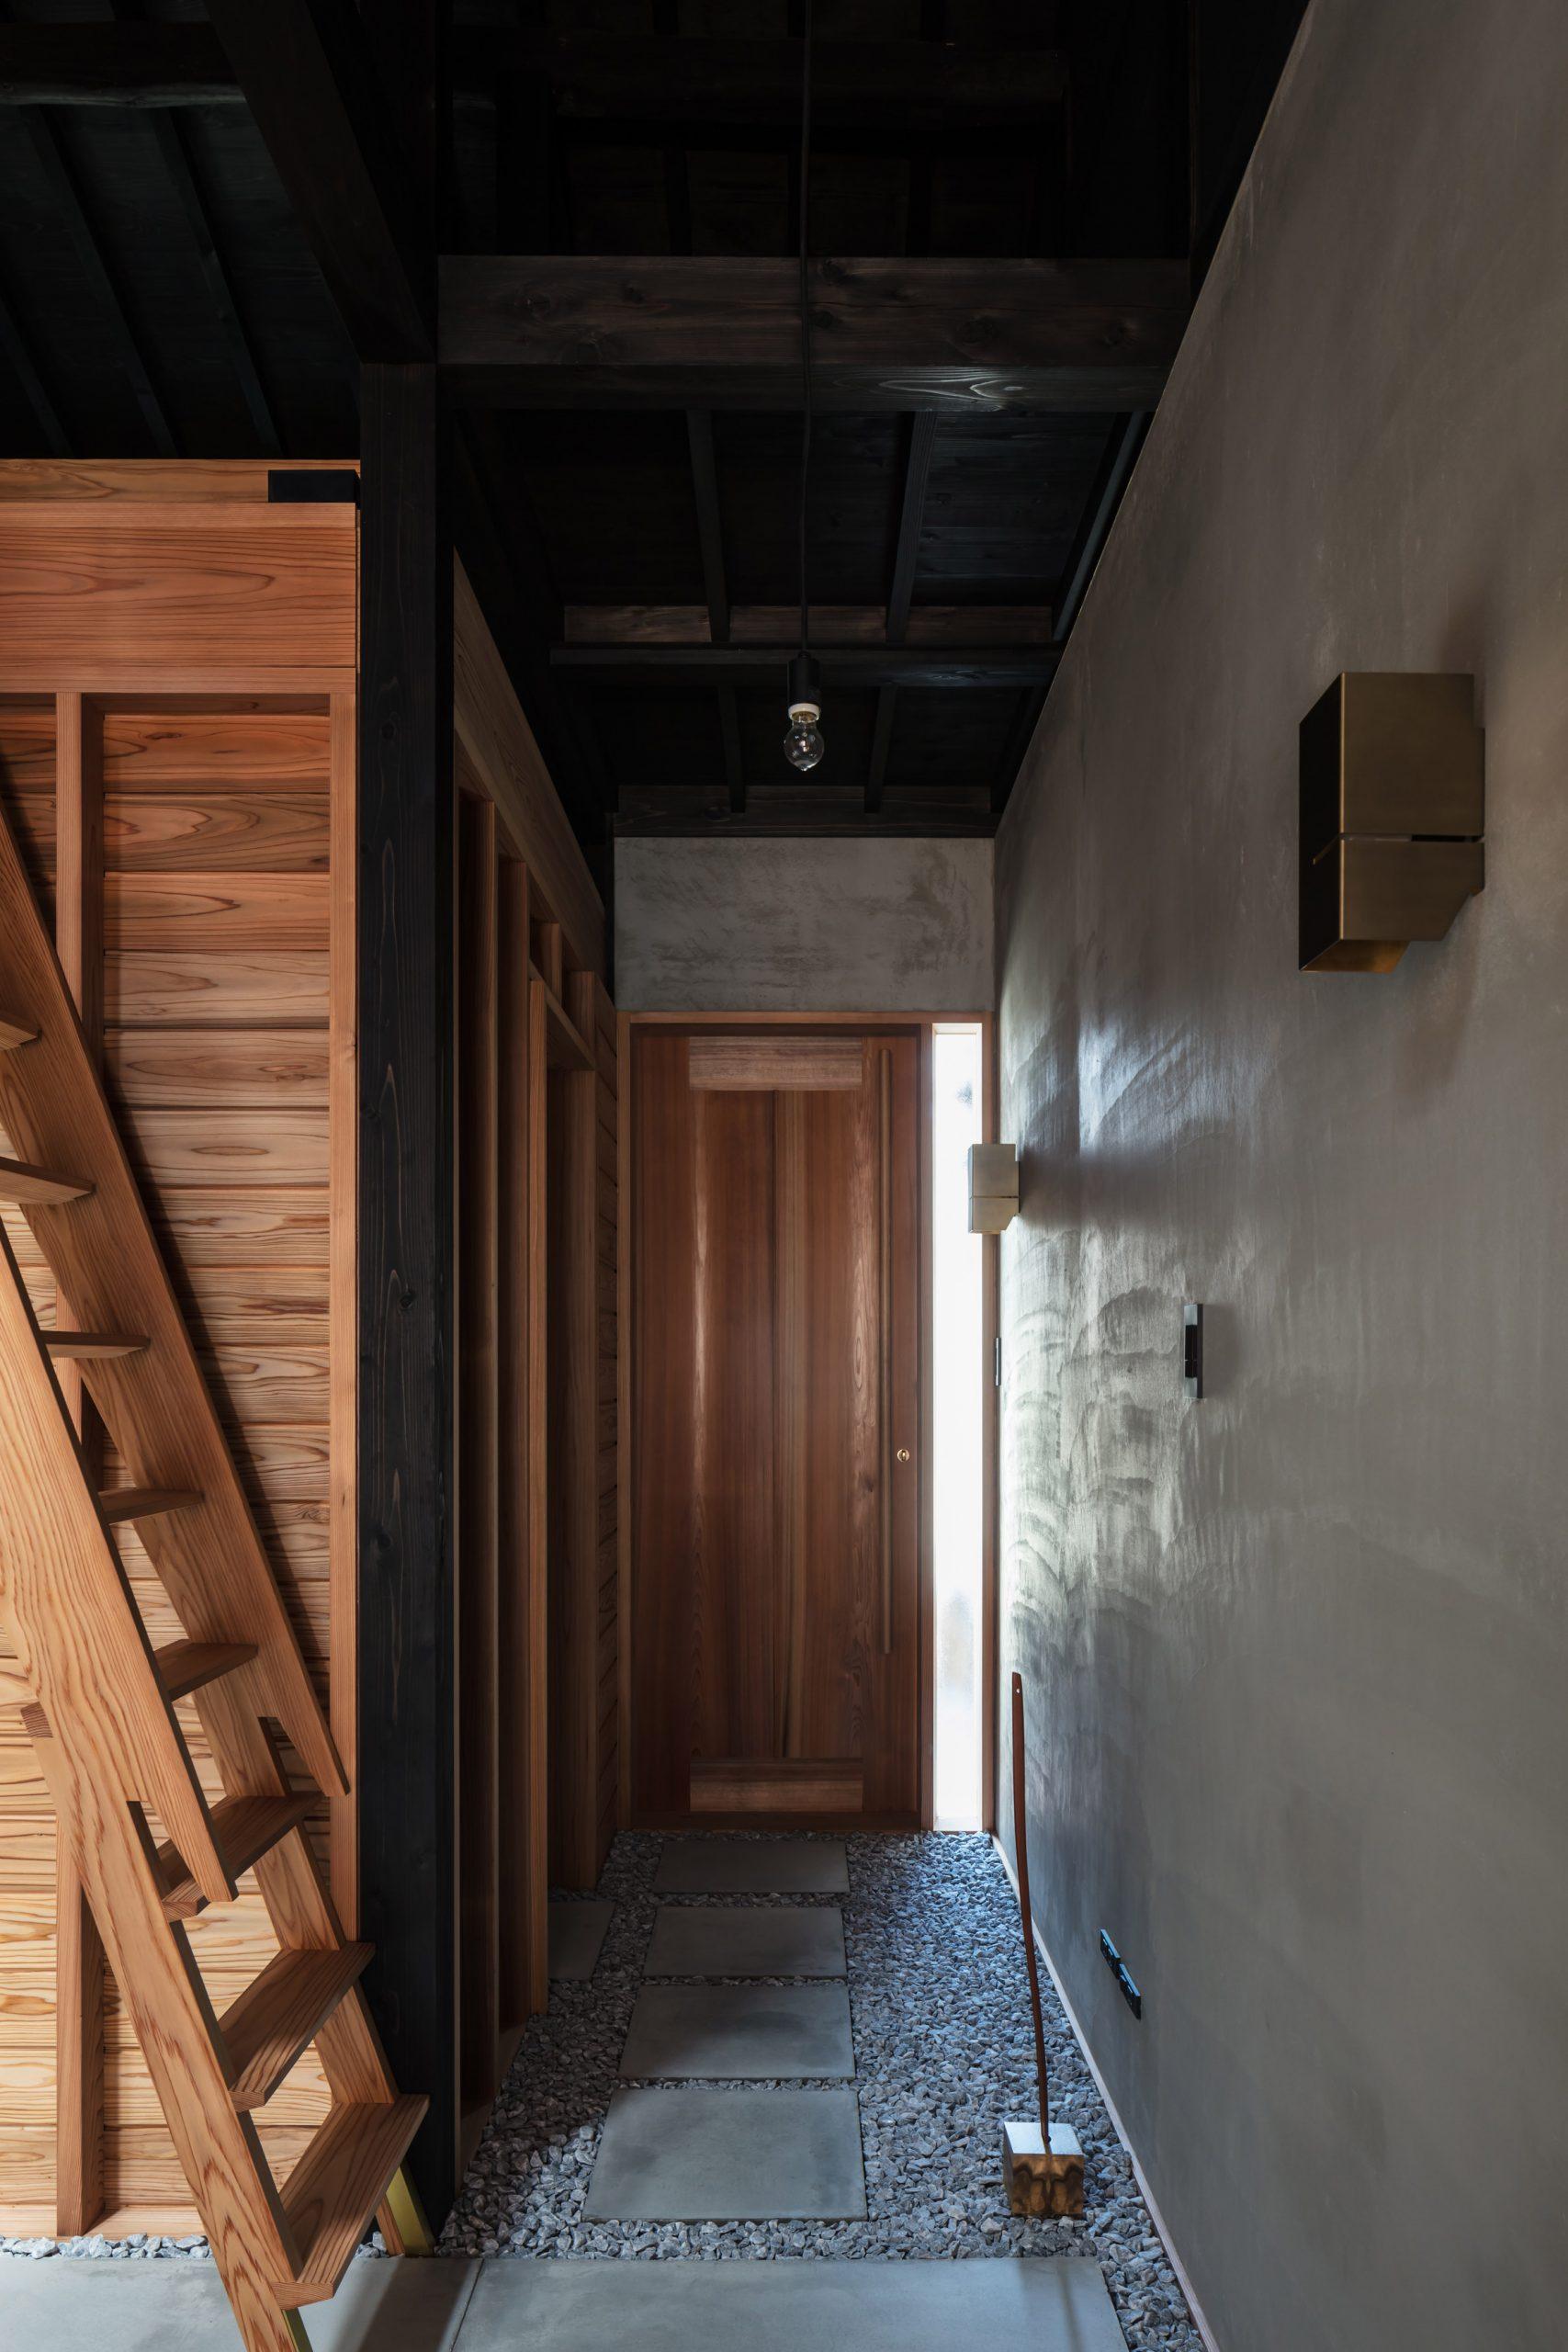 A corridor in a Japanese house